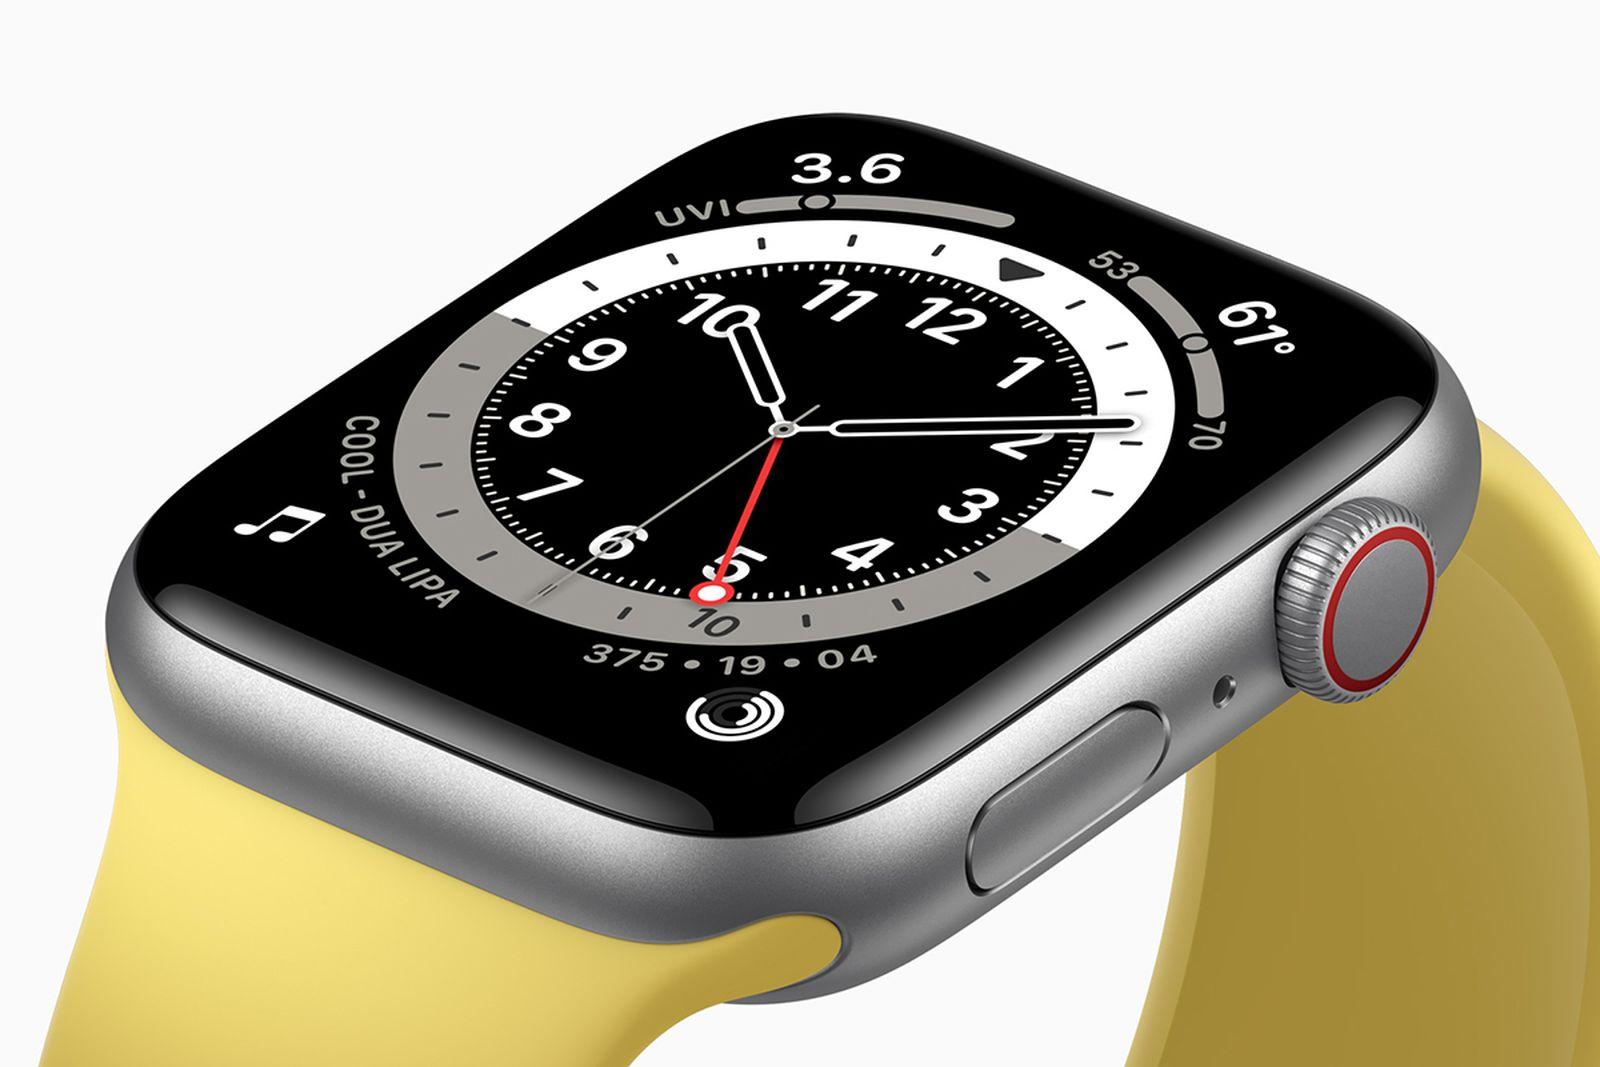 apples-wraparound-display-smartwatch-change-game-main